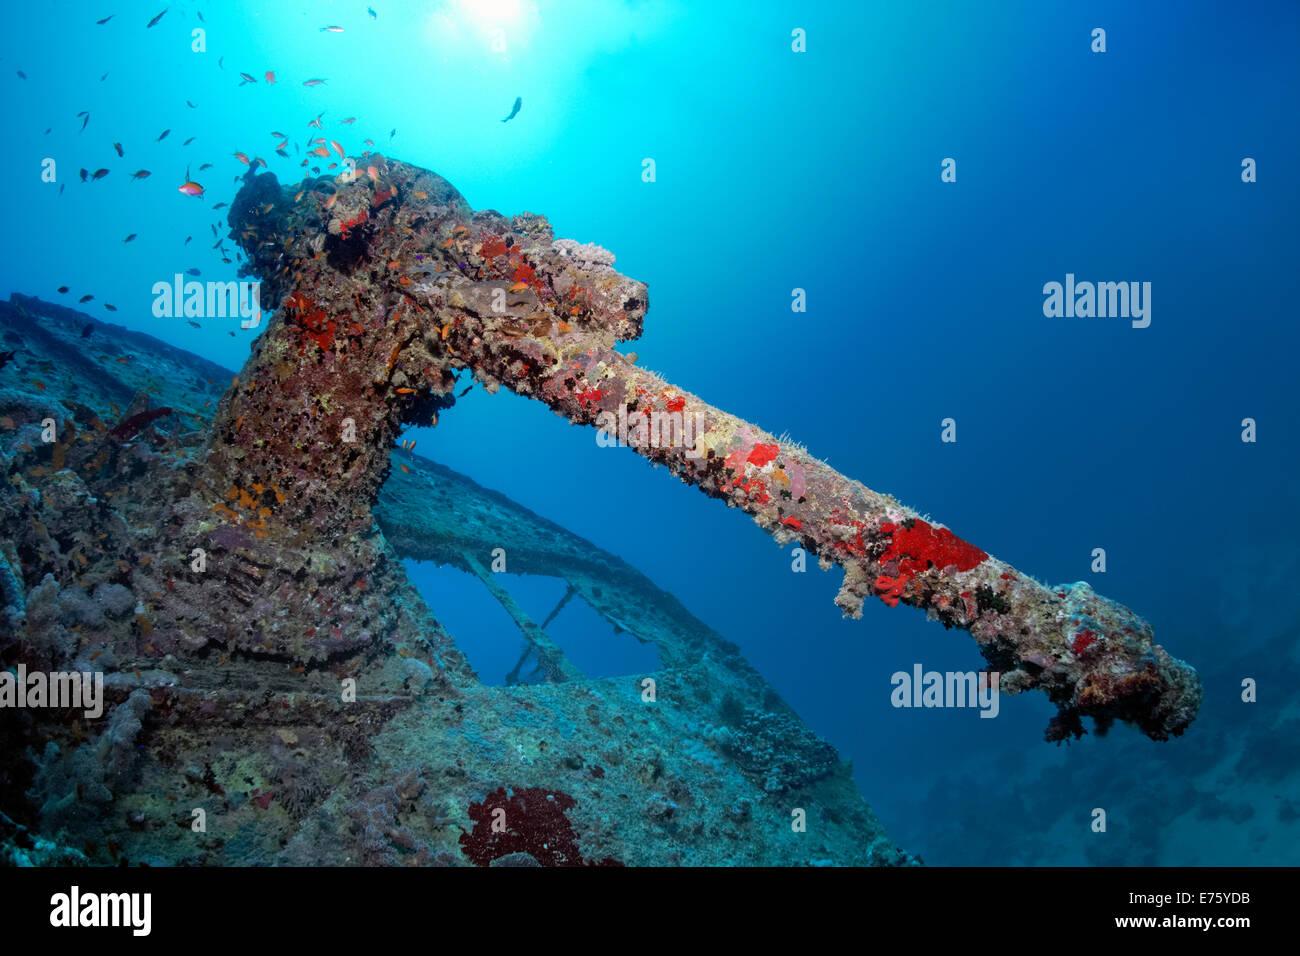 Heavy machine gun, shipwreck of the SS Thistlegorm, Red Sea, Shaab Ali, Sinai Peninsula, Egypt - Stock Image